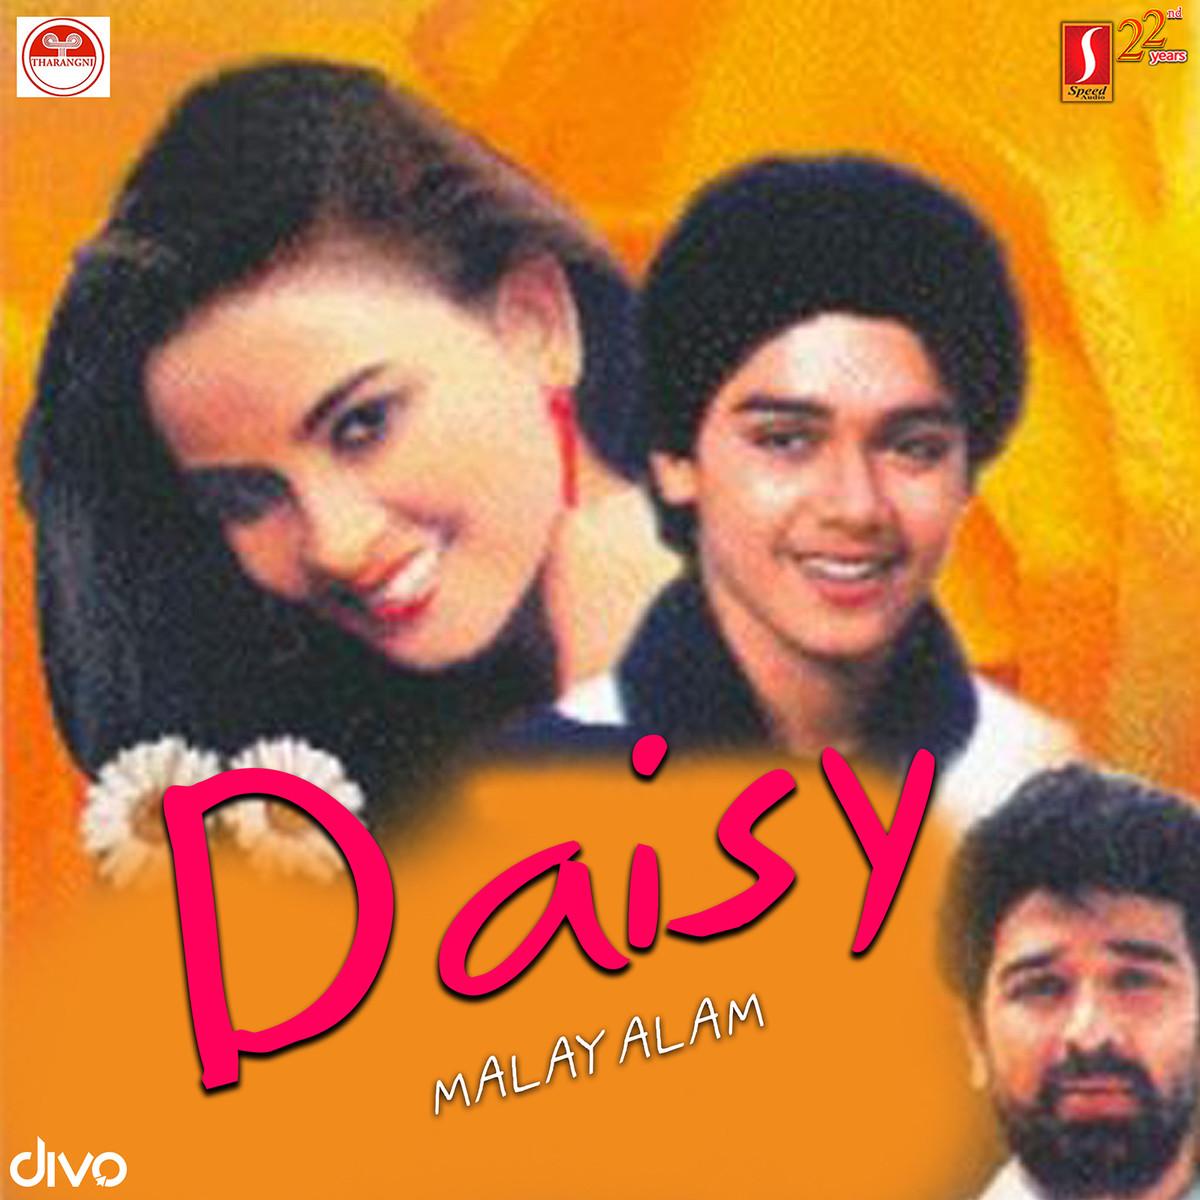 daisy malayalam movie mp3 songs free download